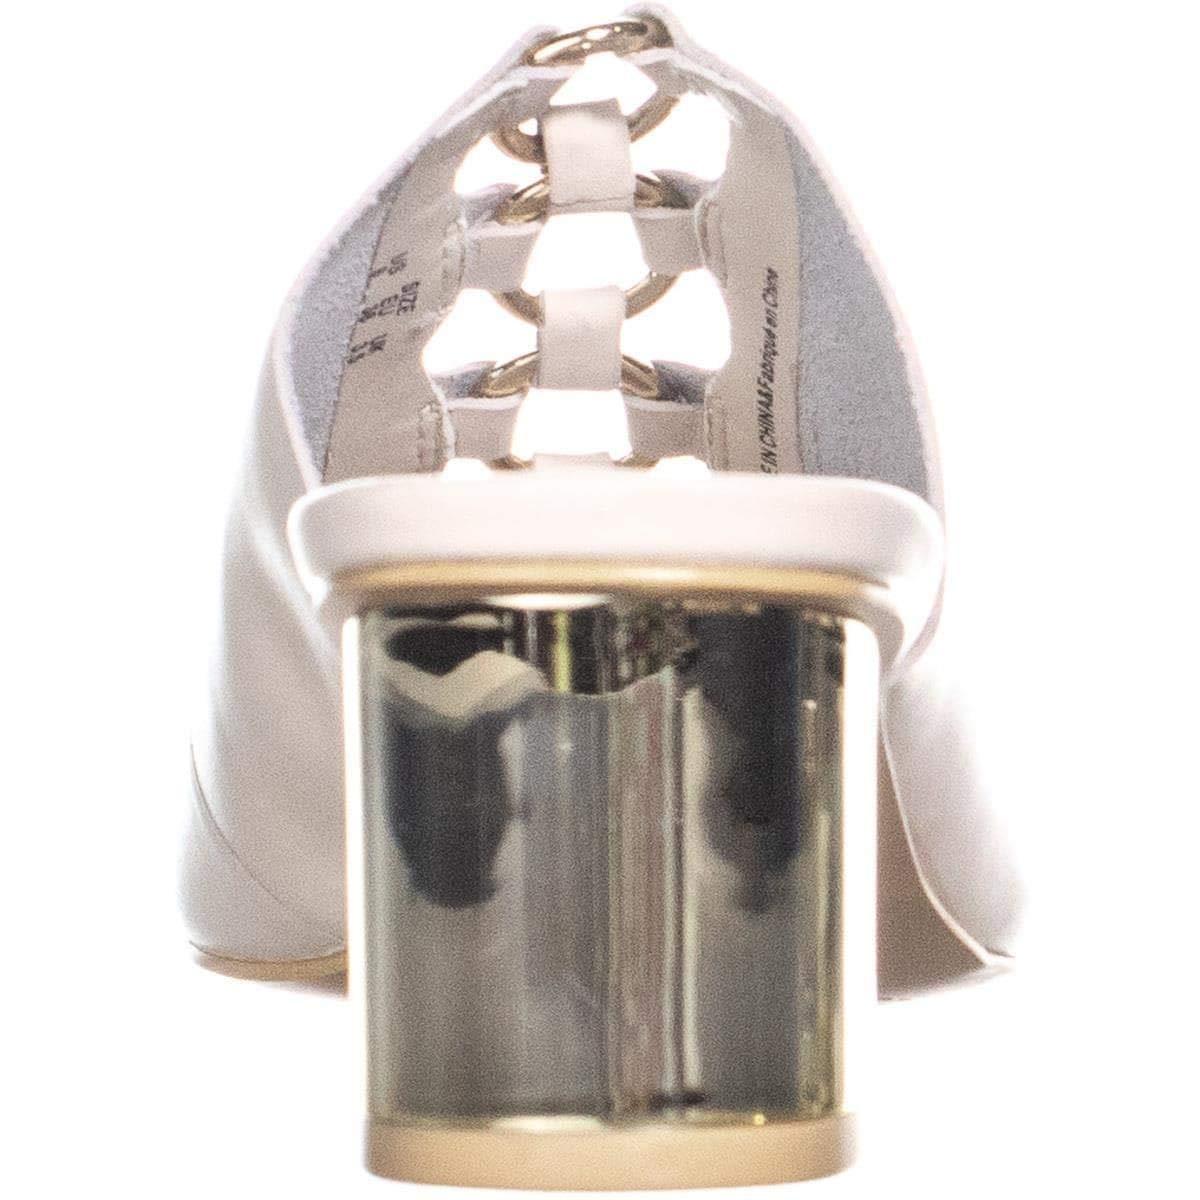 DKNY Womens Greyson Leather Peep Toe Mules Stone Size 8.5